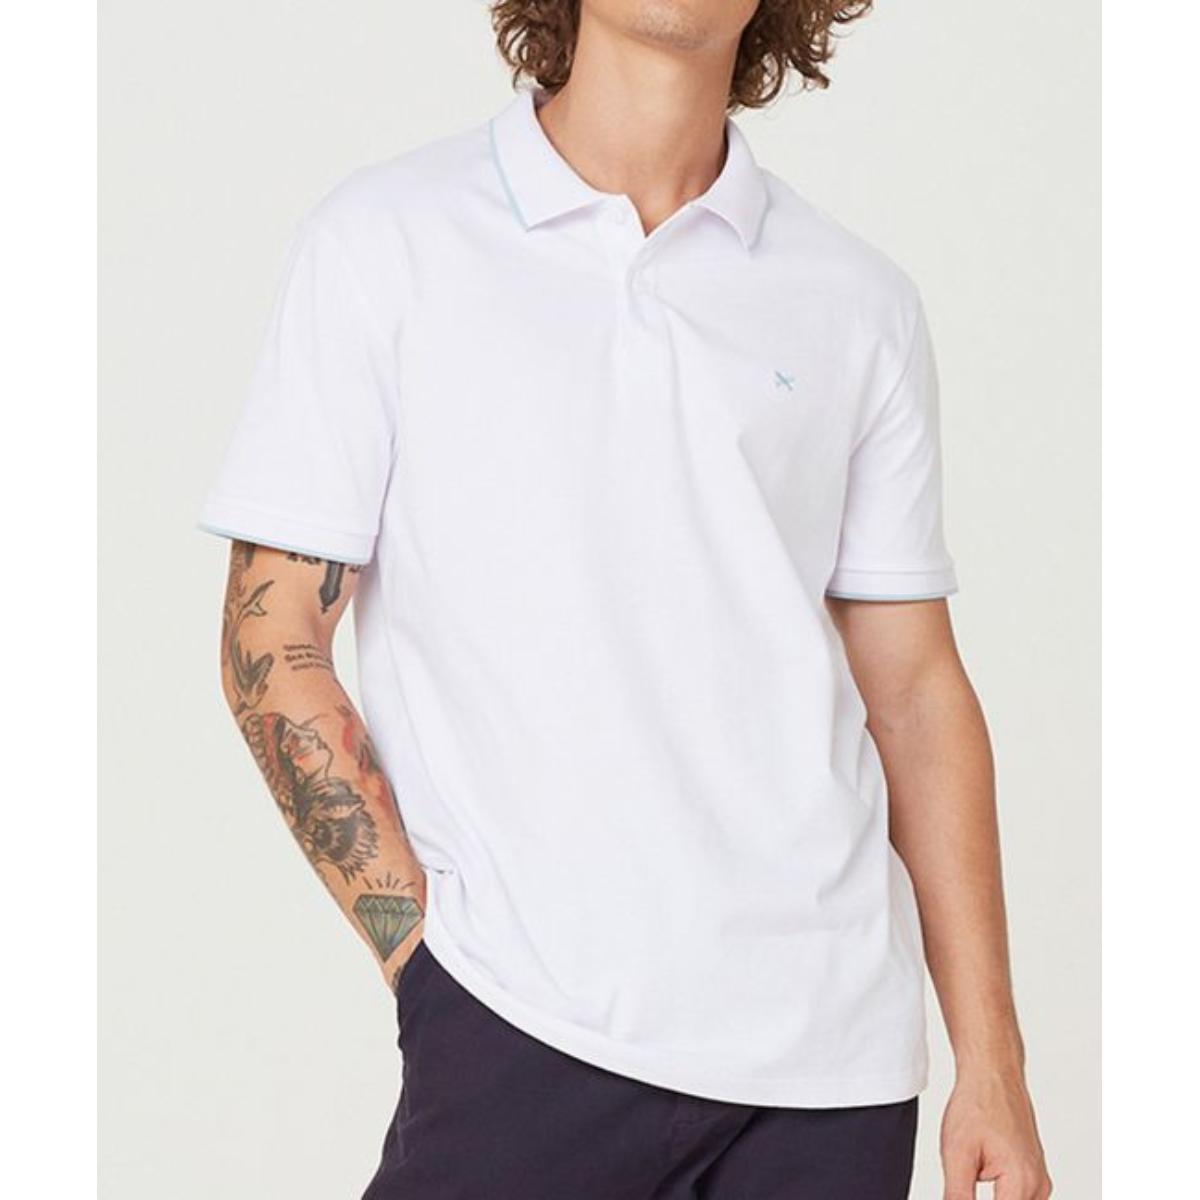 Camiseta Masculina Hering 3m4m 1aen Branco/azul